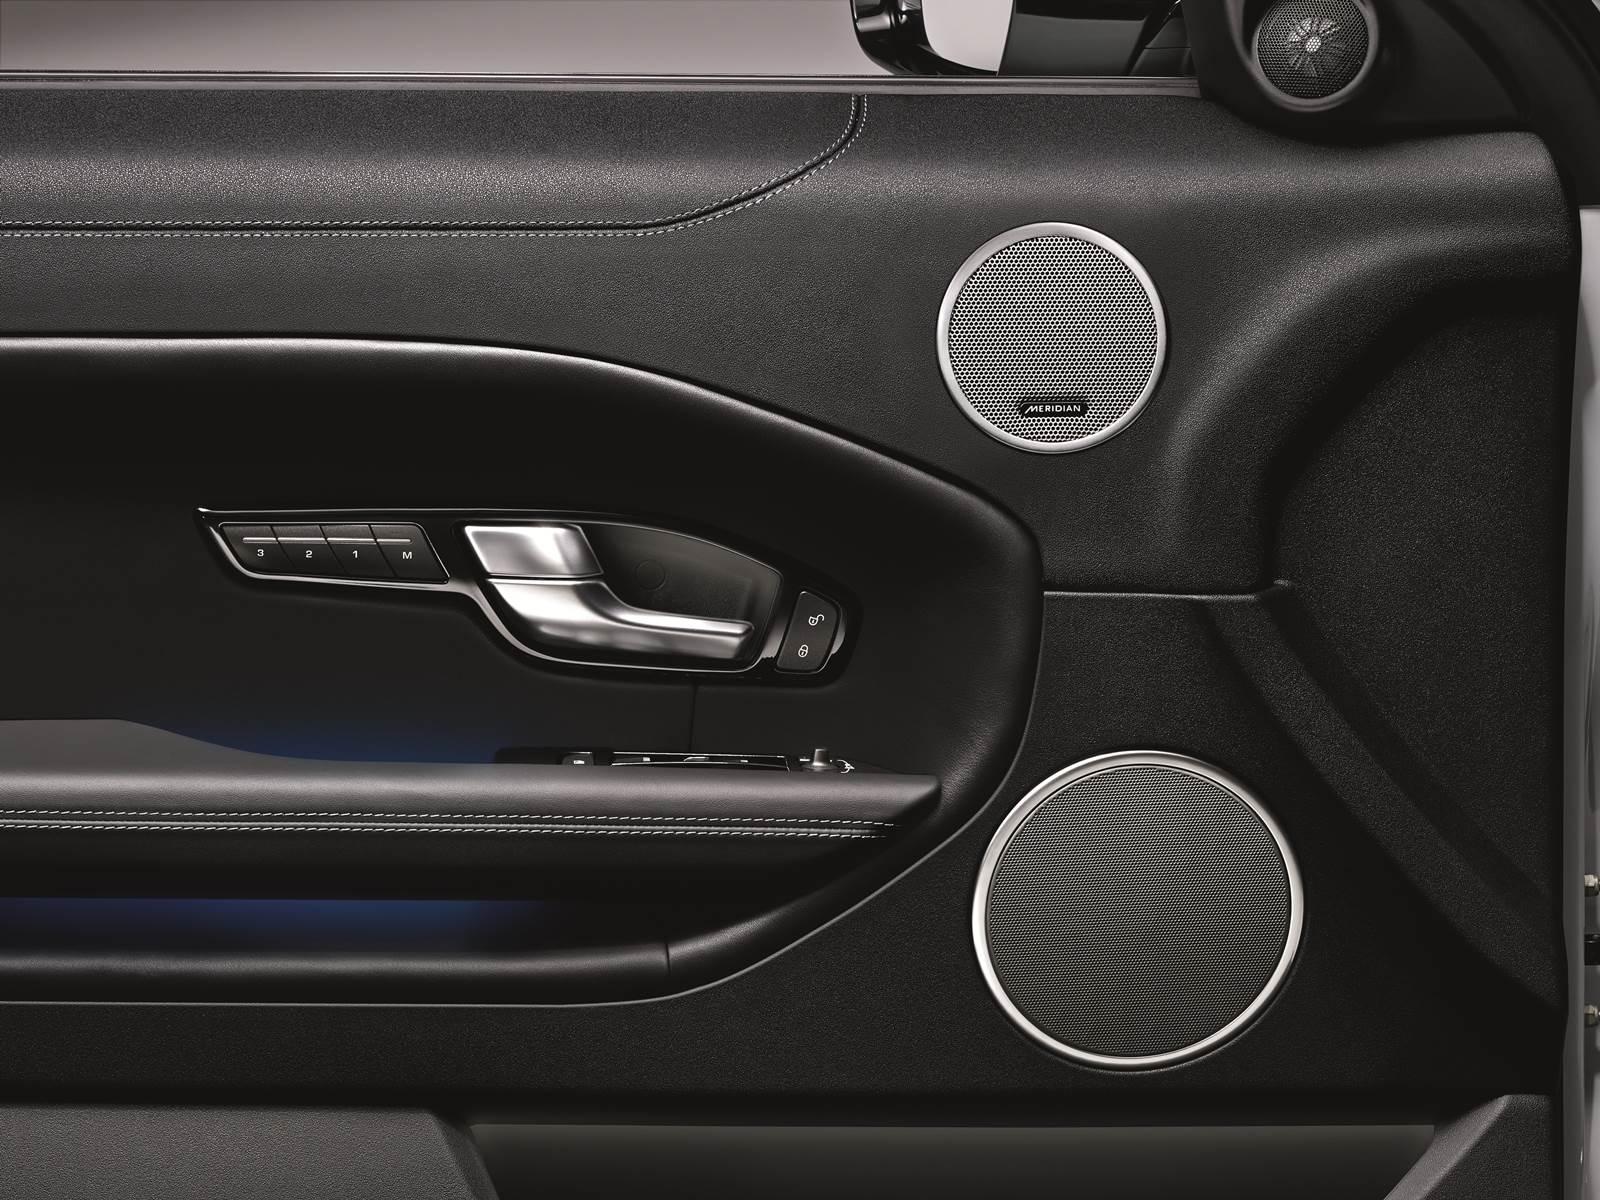 Novo Range Rover Evoque 2016 - interior